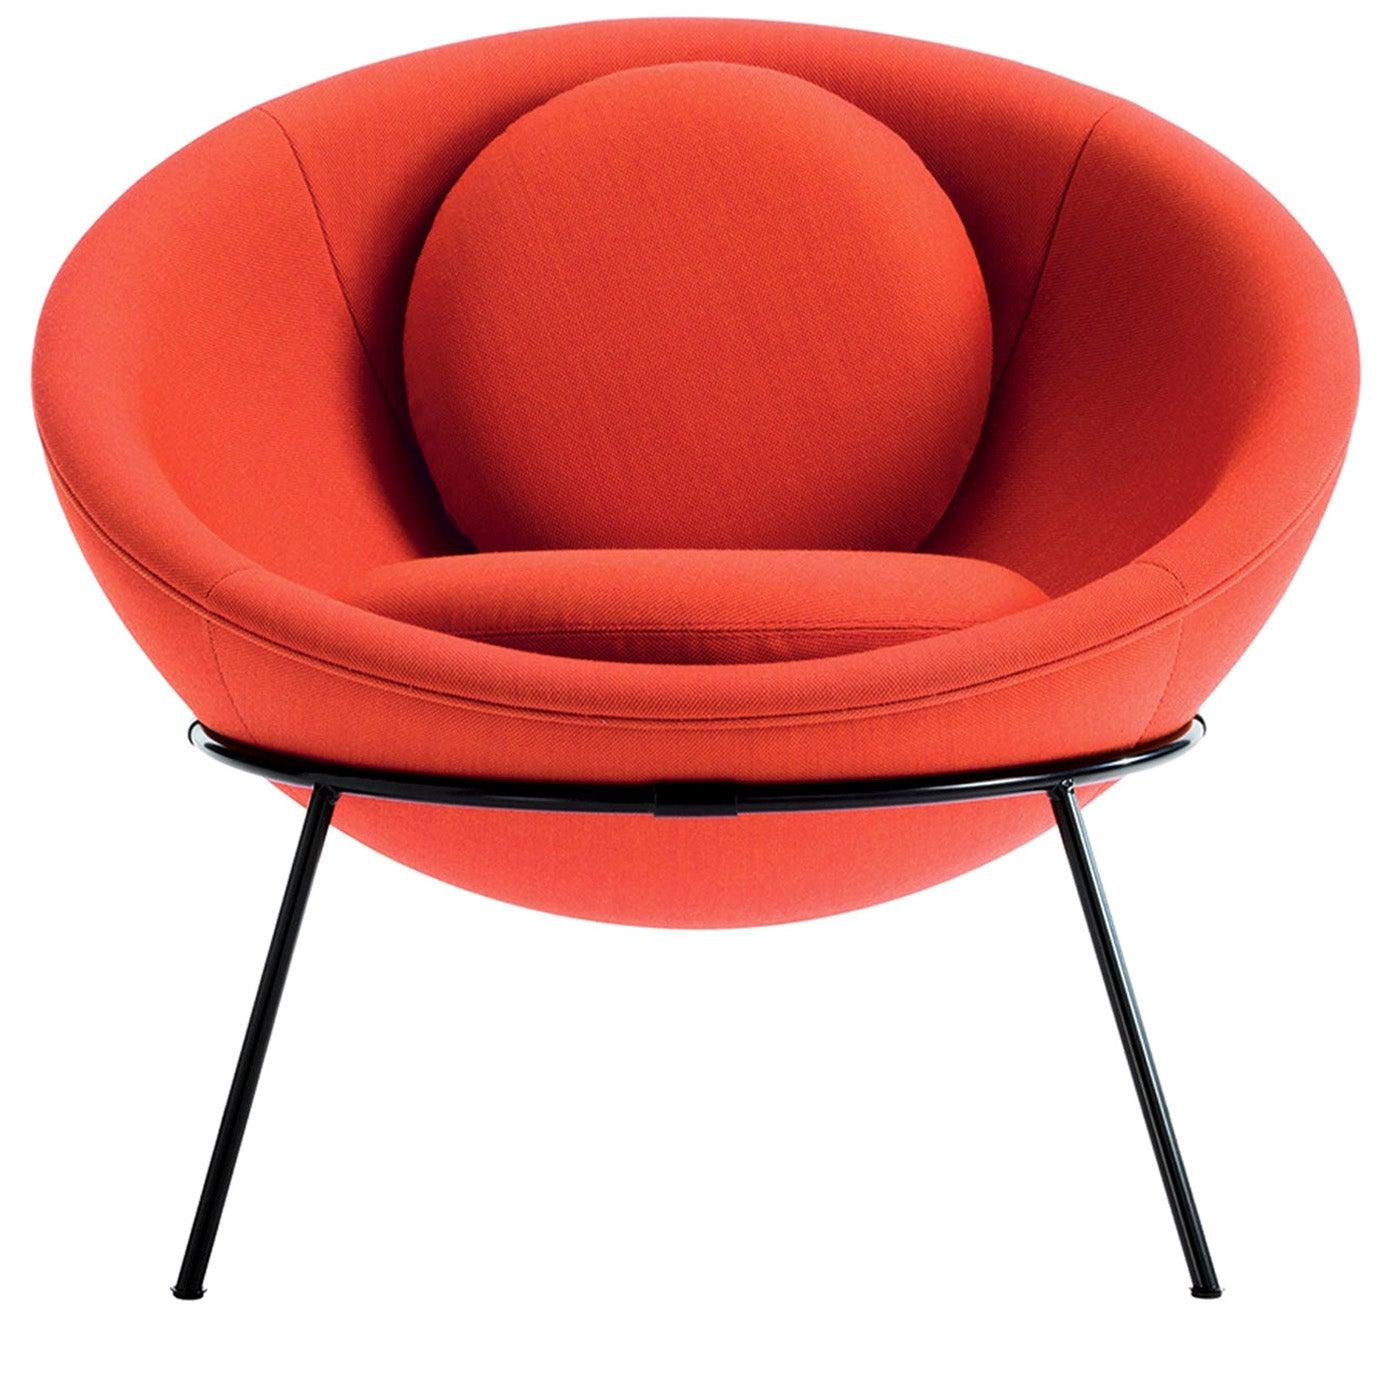 Bardi's Bowl Chair Orange